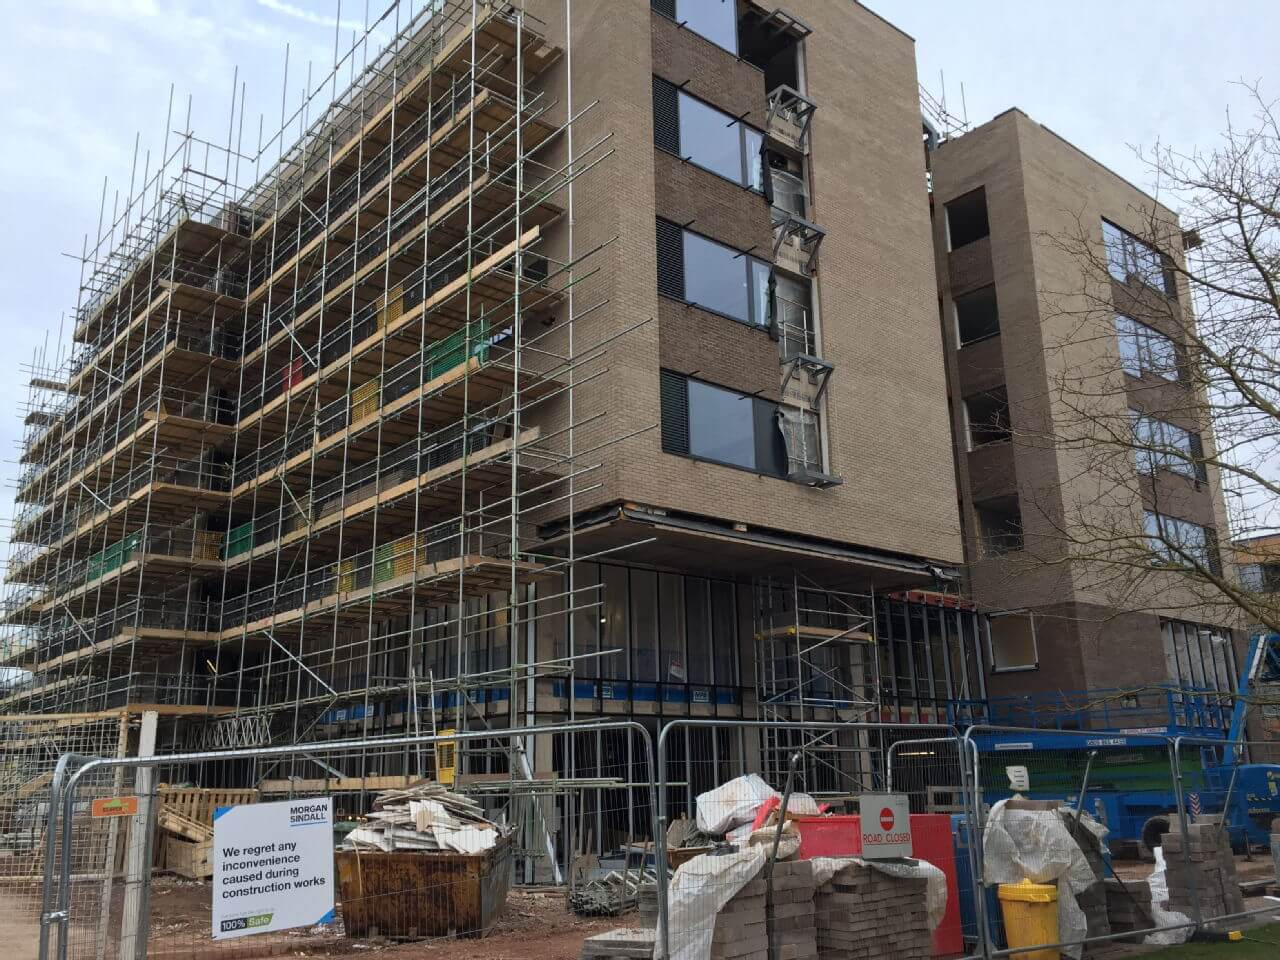 The new interdisciplinary building under construction